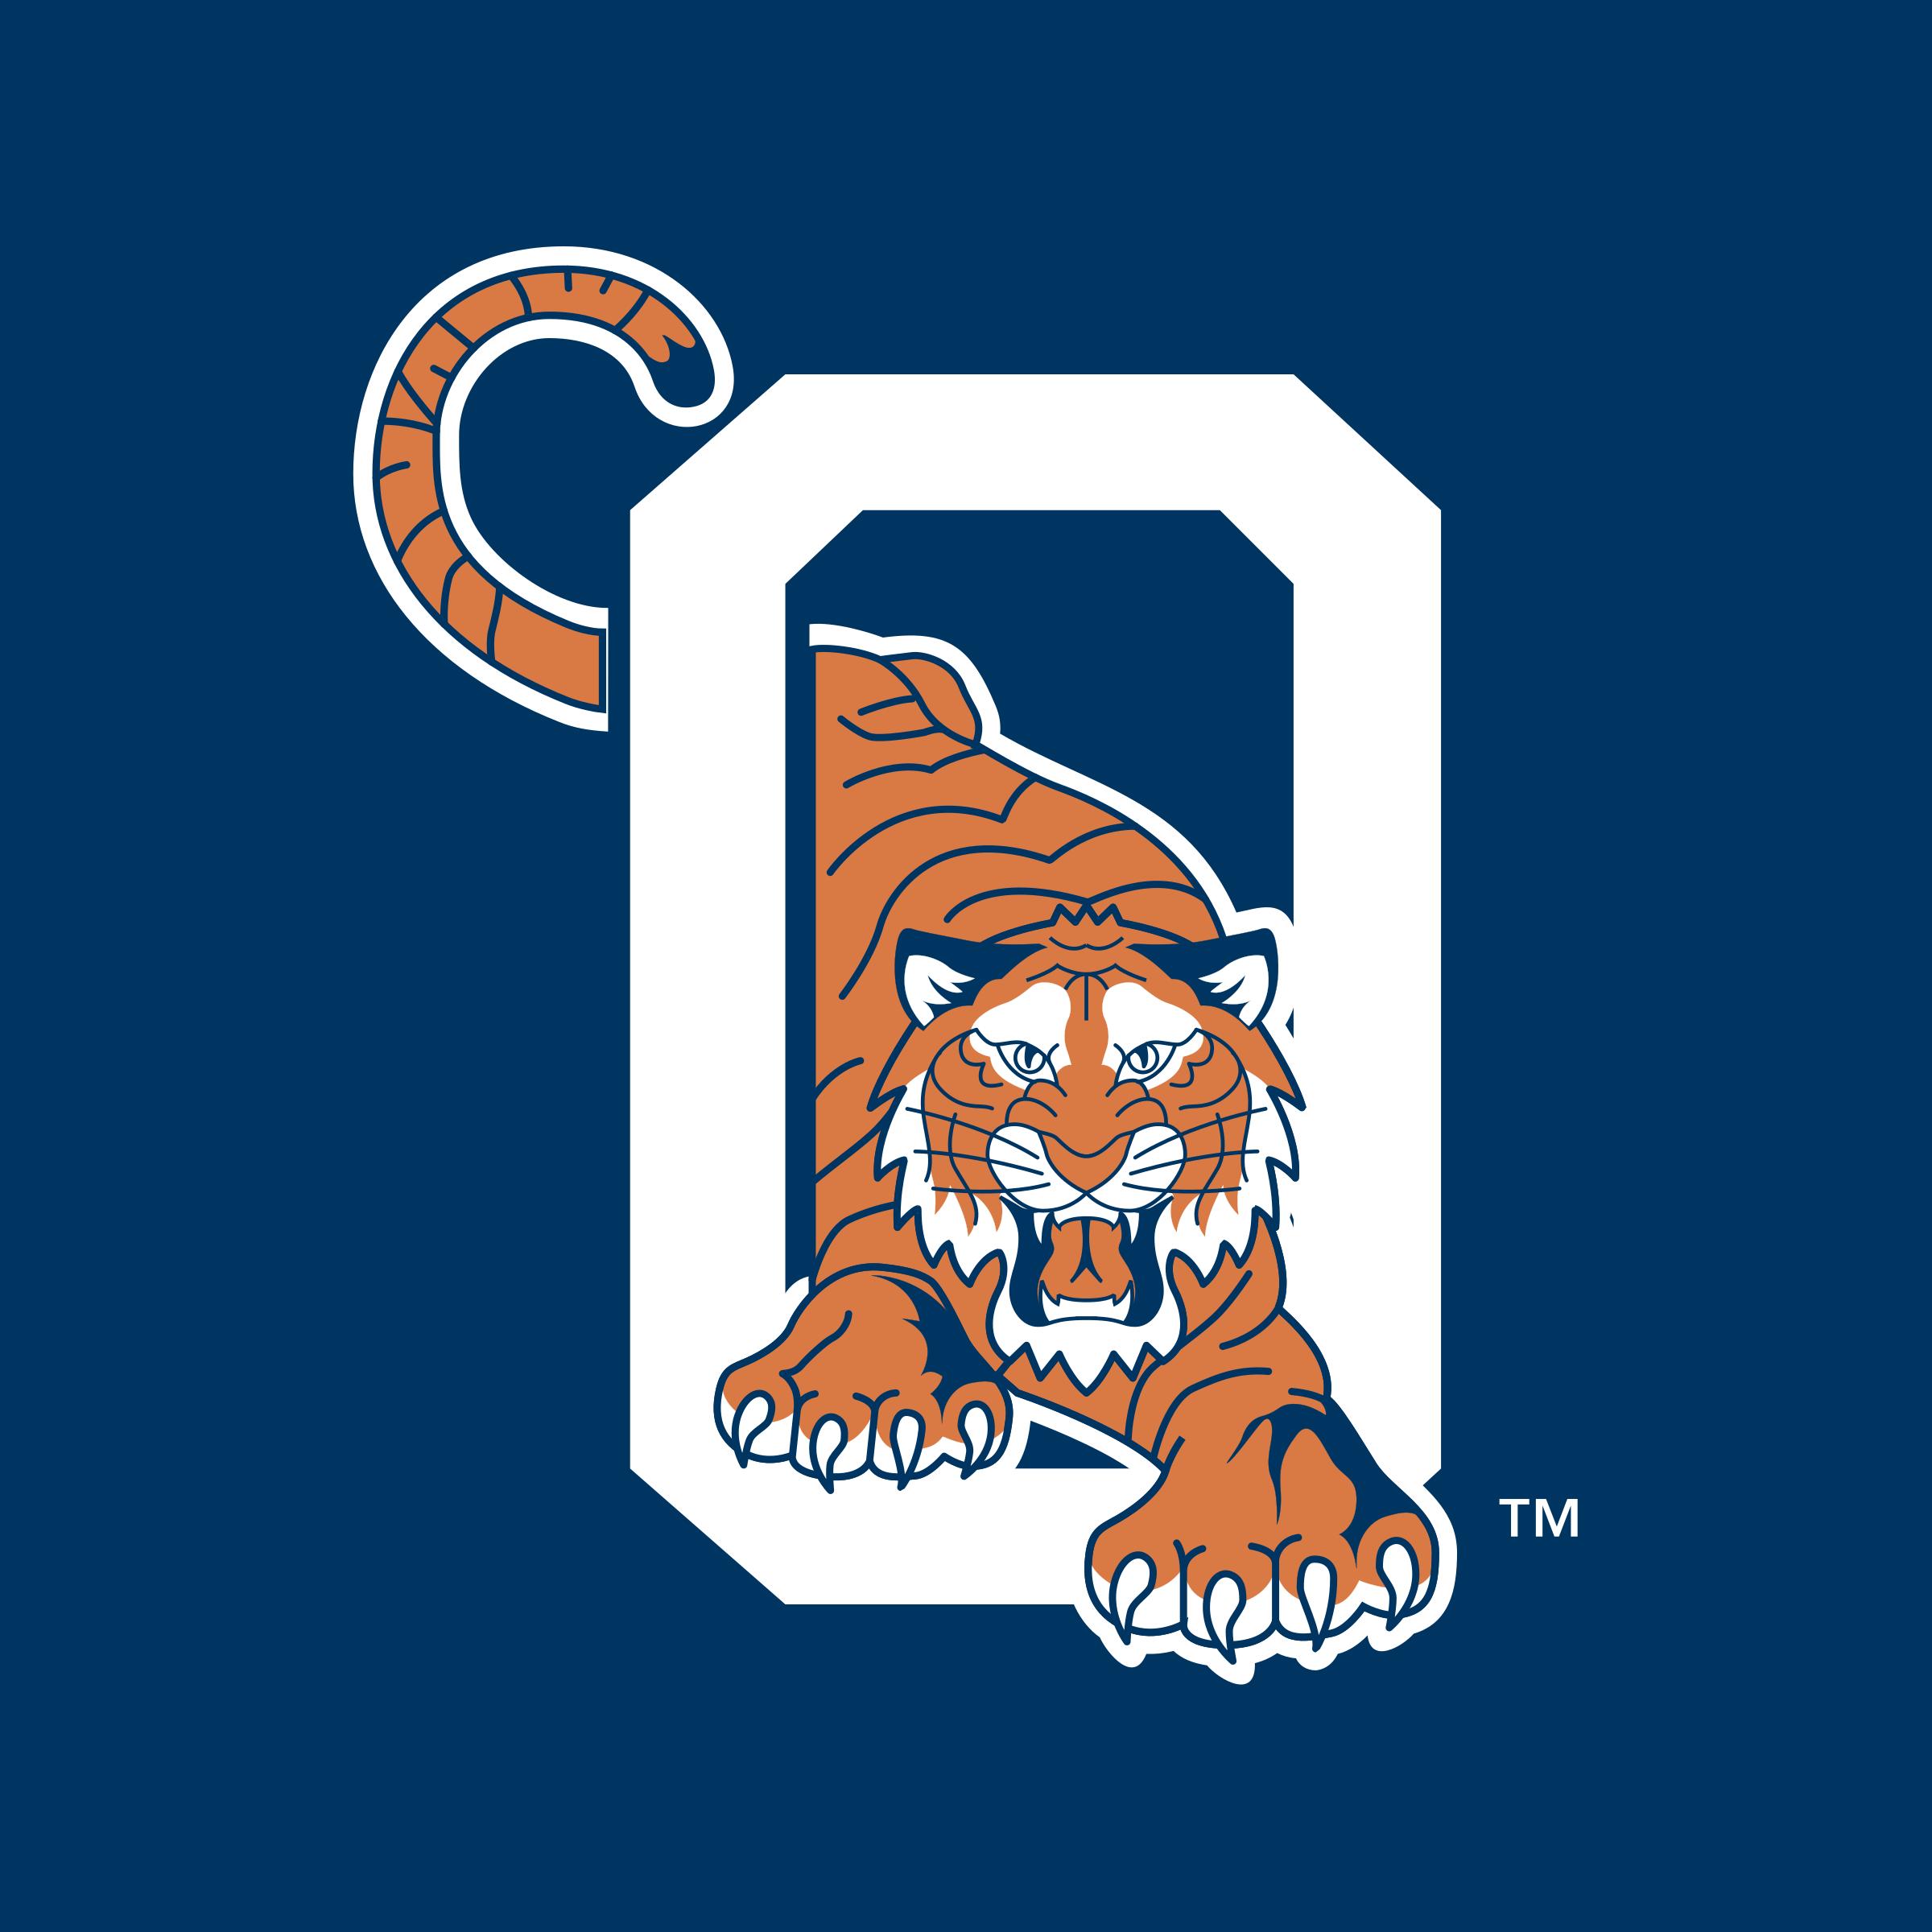 Oneonta Tigers Logo PNG Transparent & SVG Vector.